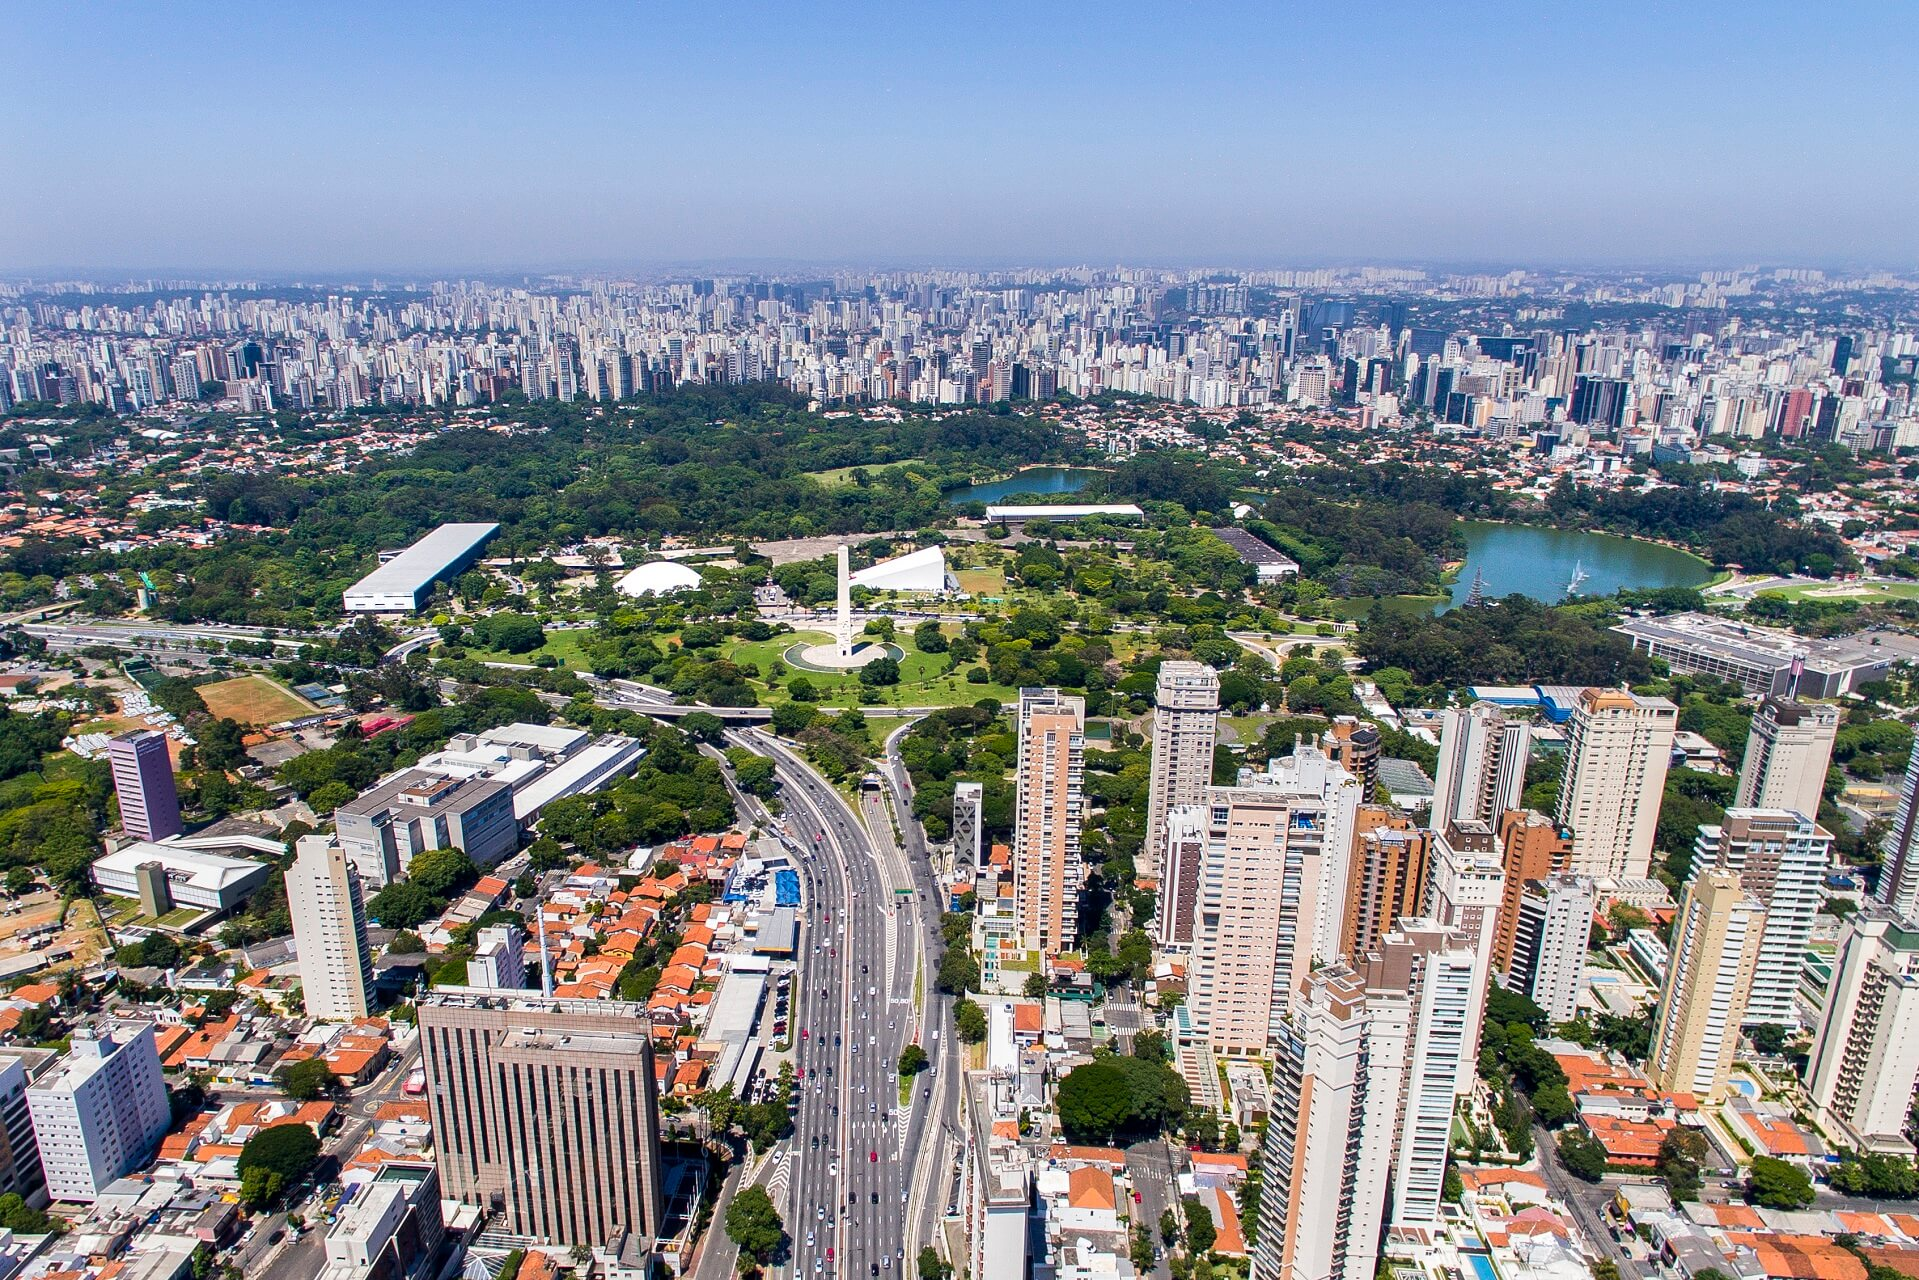 Die Skyline São Paulos ist absolut beeindruckend